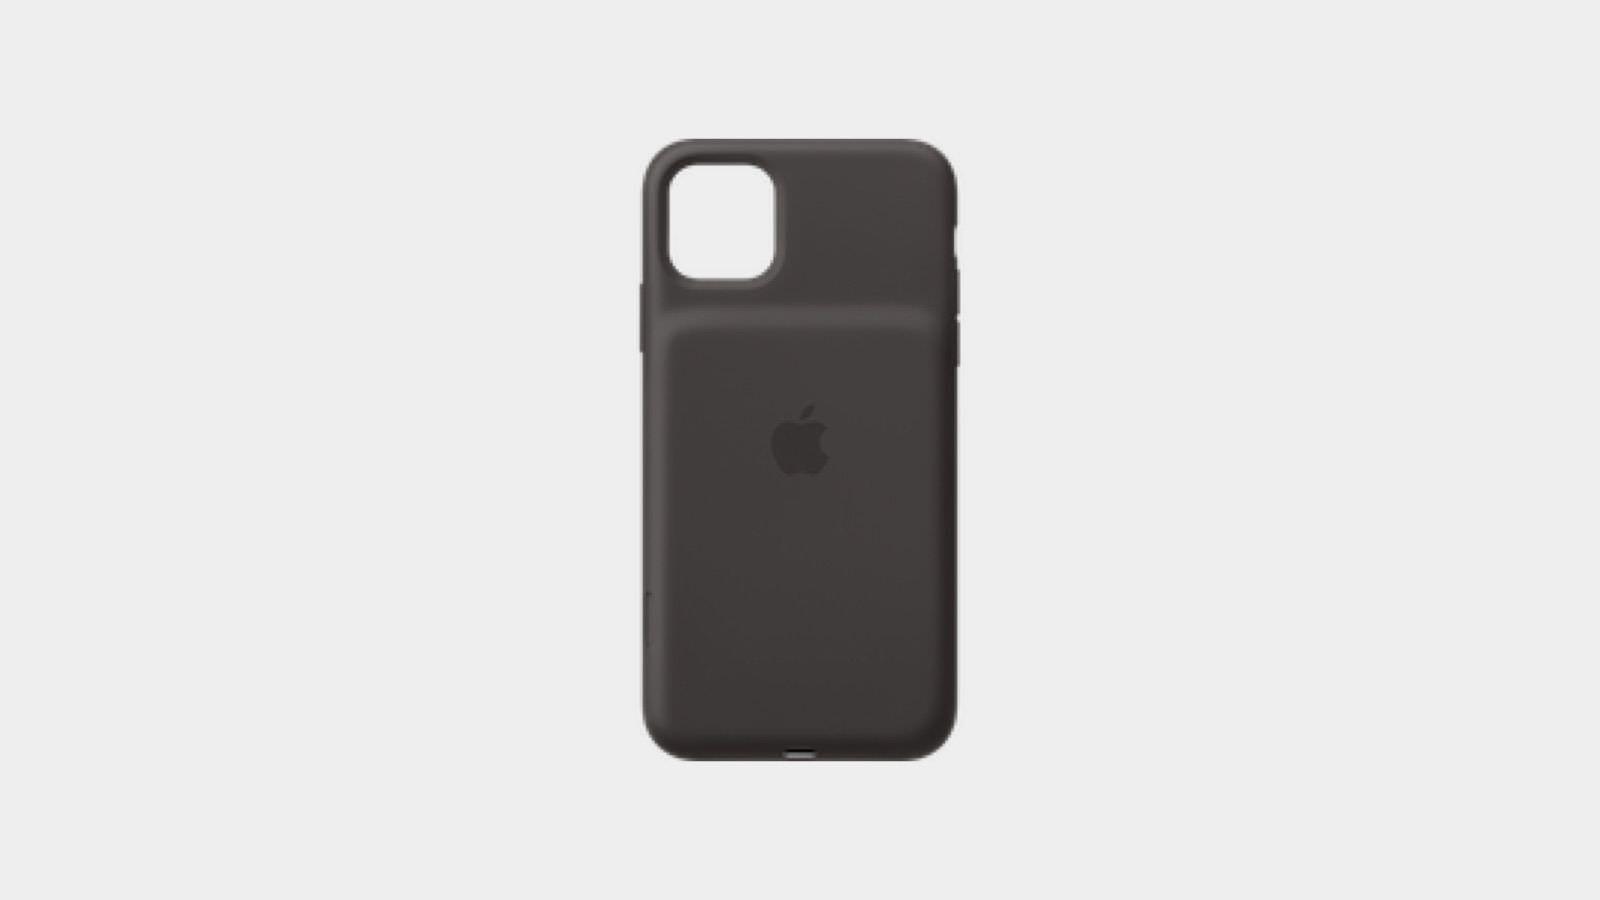 iPhone11-Smart-Battery-Case-01.jpg